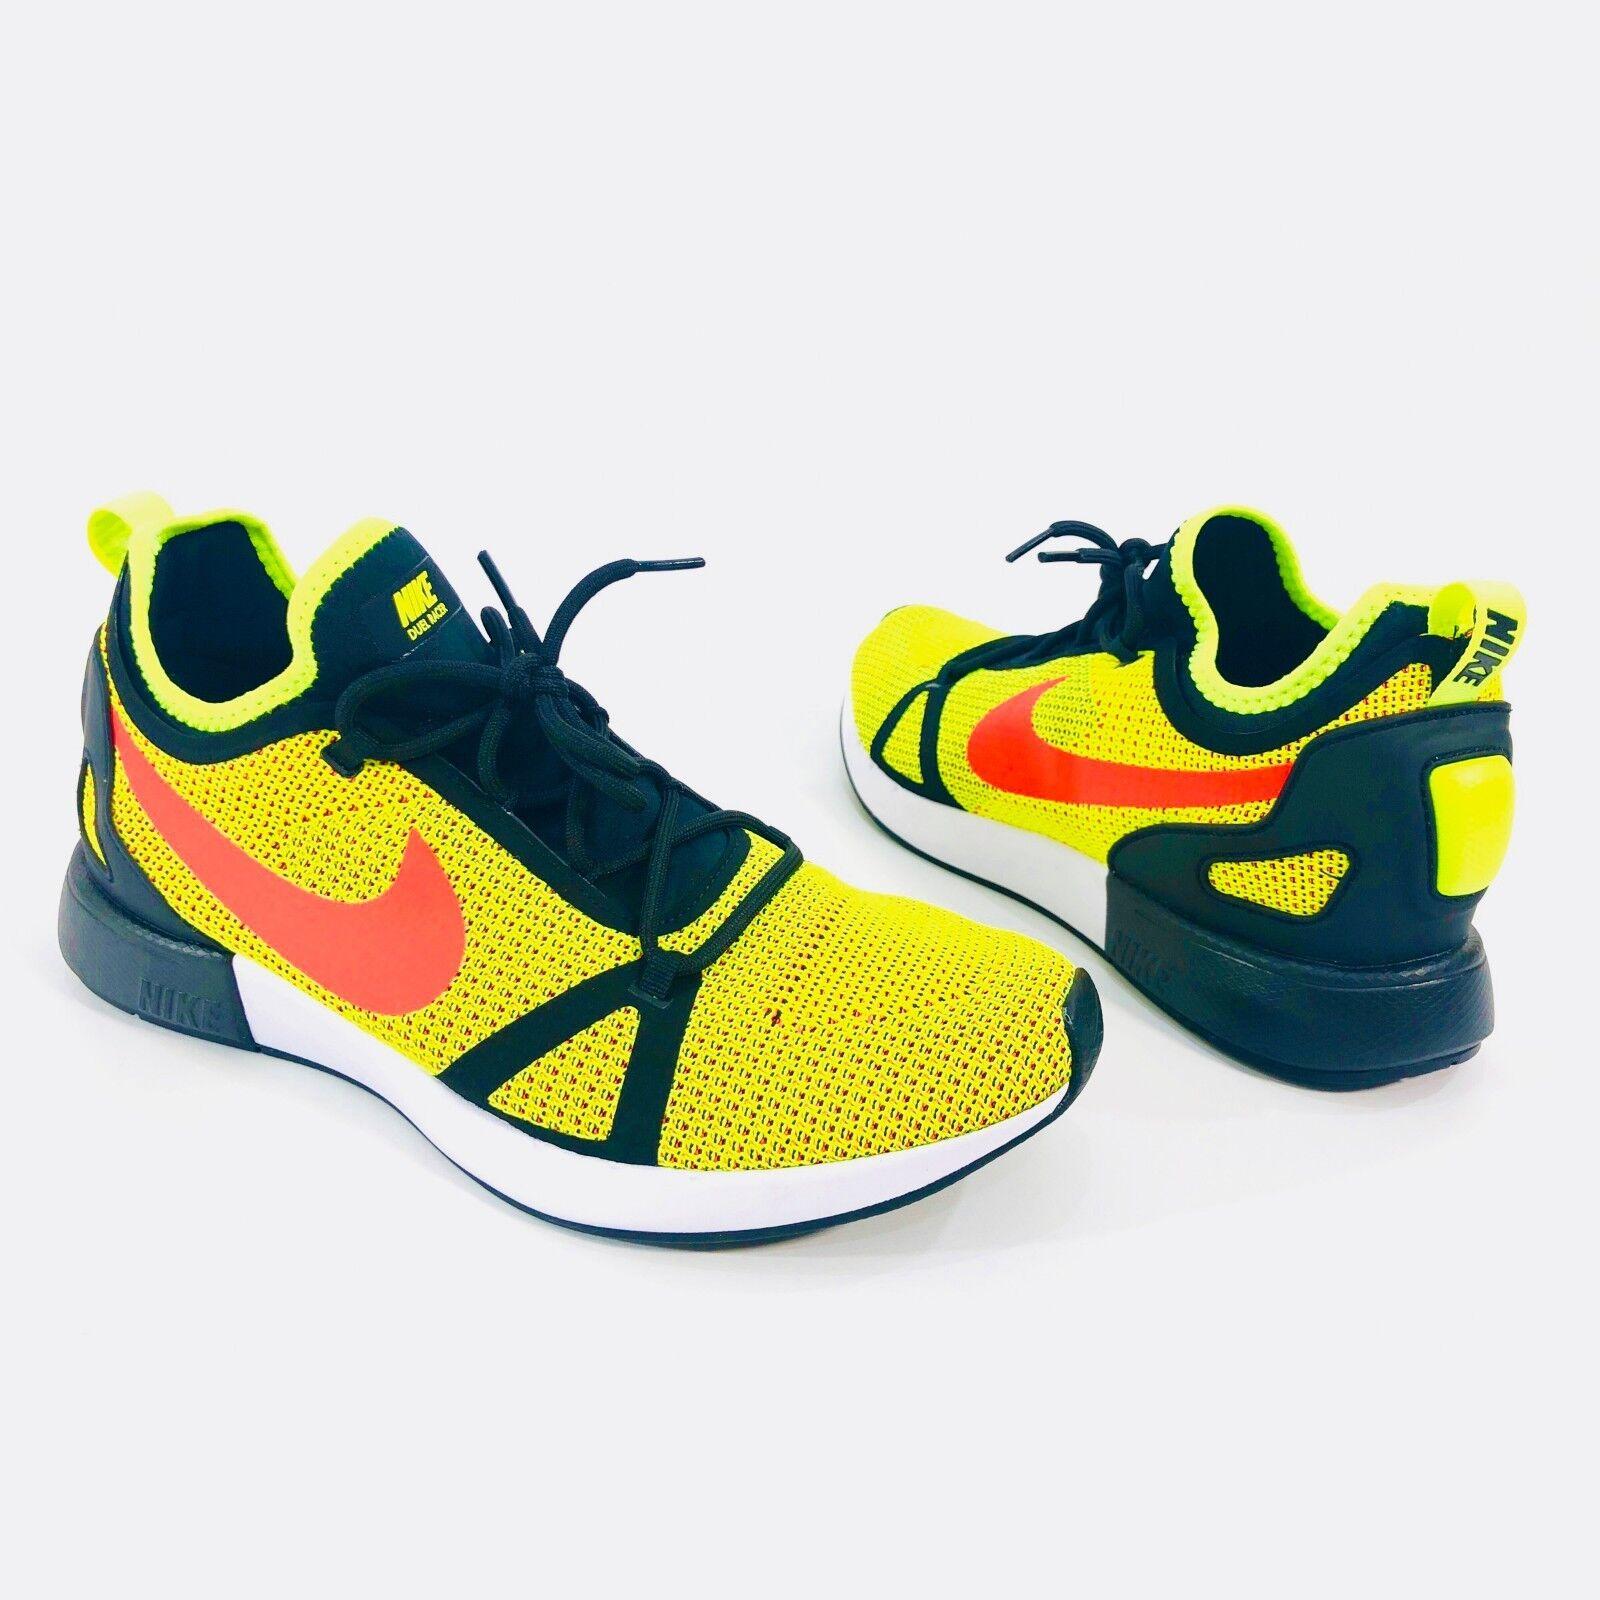 ea6450e85a992 Nike Duel Racer Mens Size 10.5 Volt Bright Crimson Black Running Shoe  918228-700